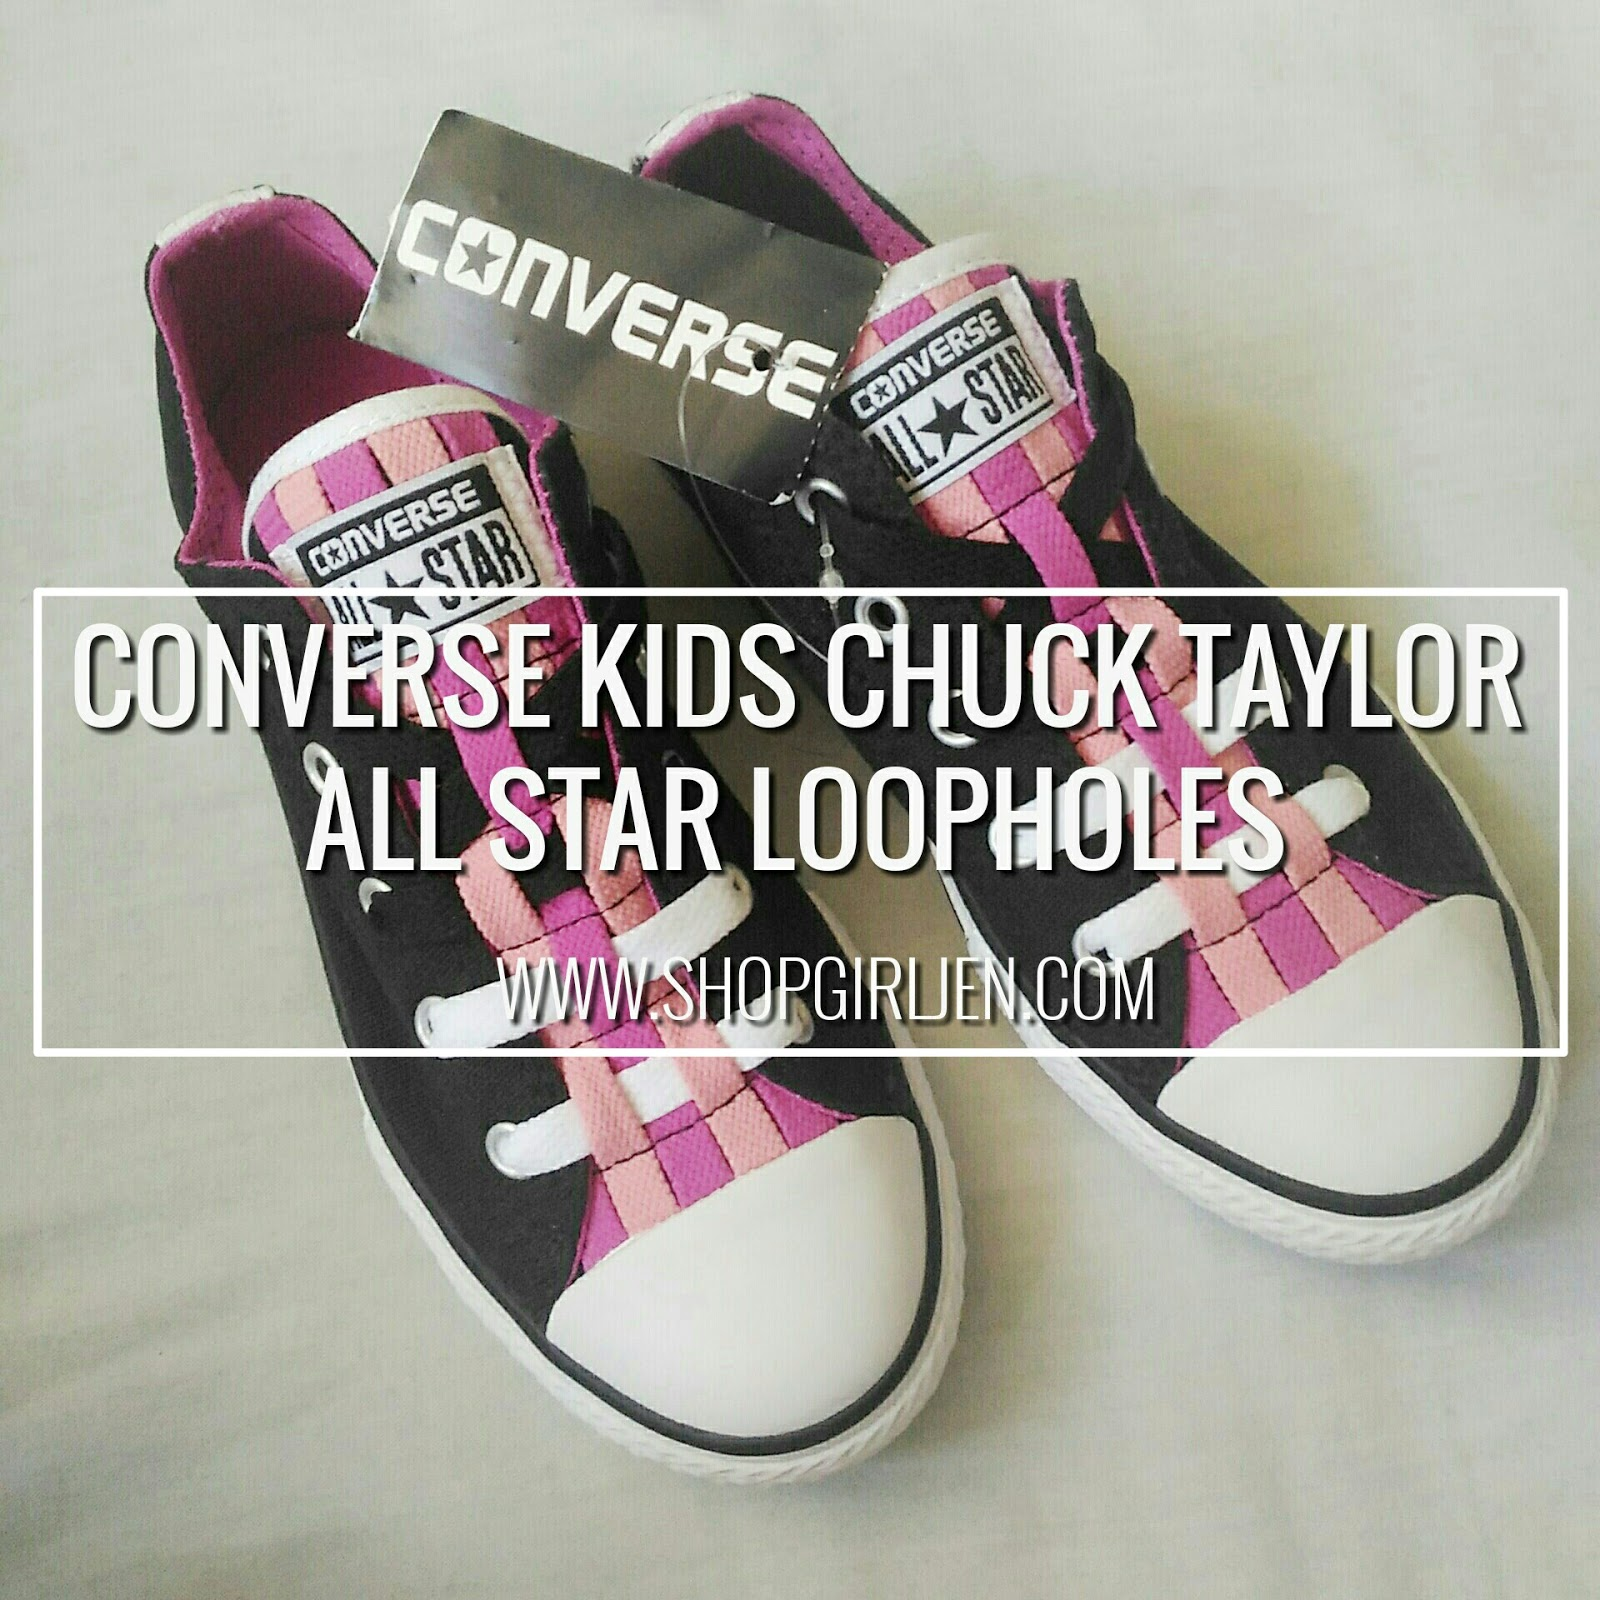 11079cfe9c0e Shopgirl Jen  CONVERSE UNVEILS KIDS CHUCK TAYLOR ALL STAR LOOPHOLE  COLLECTION